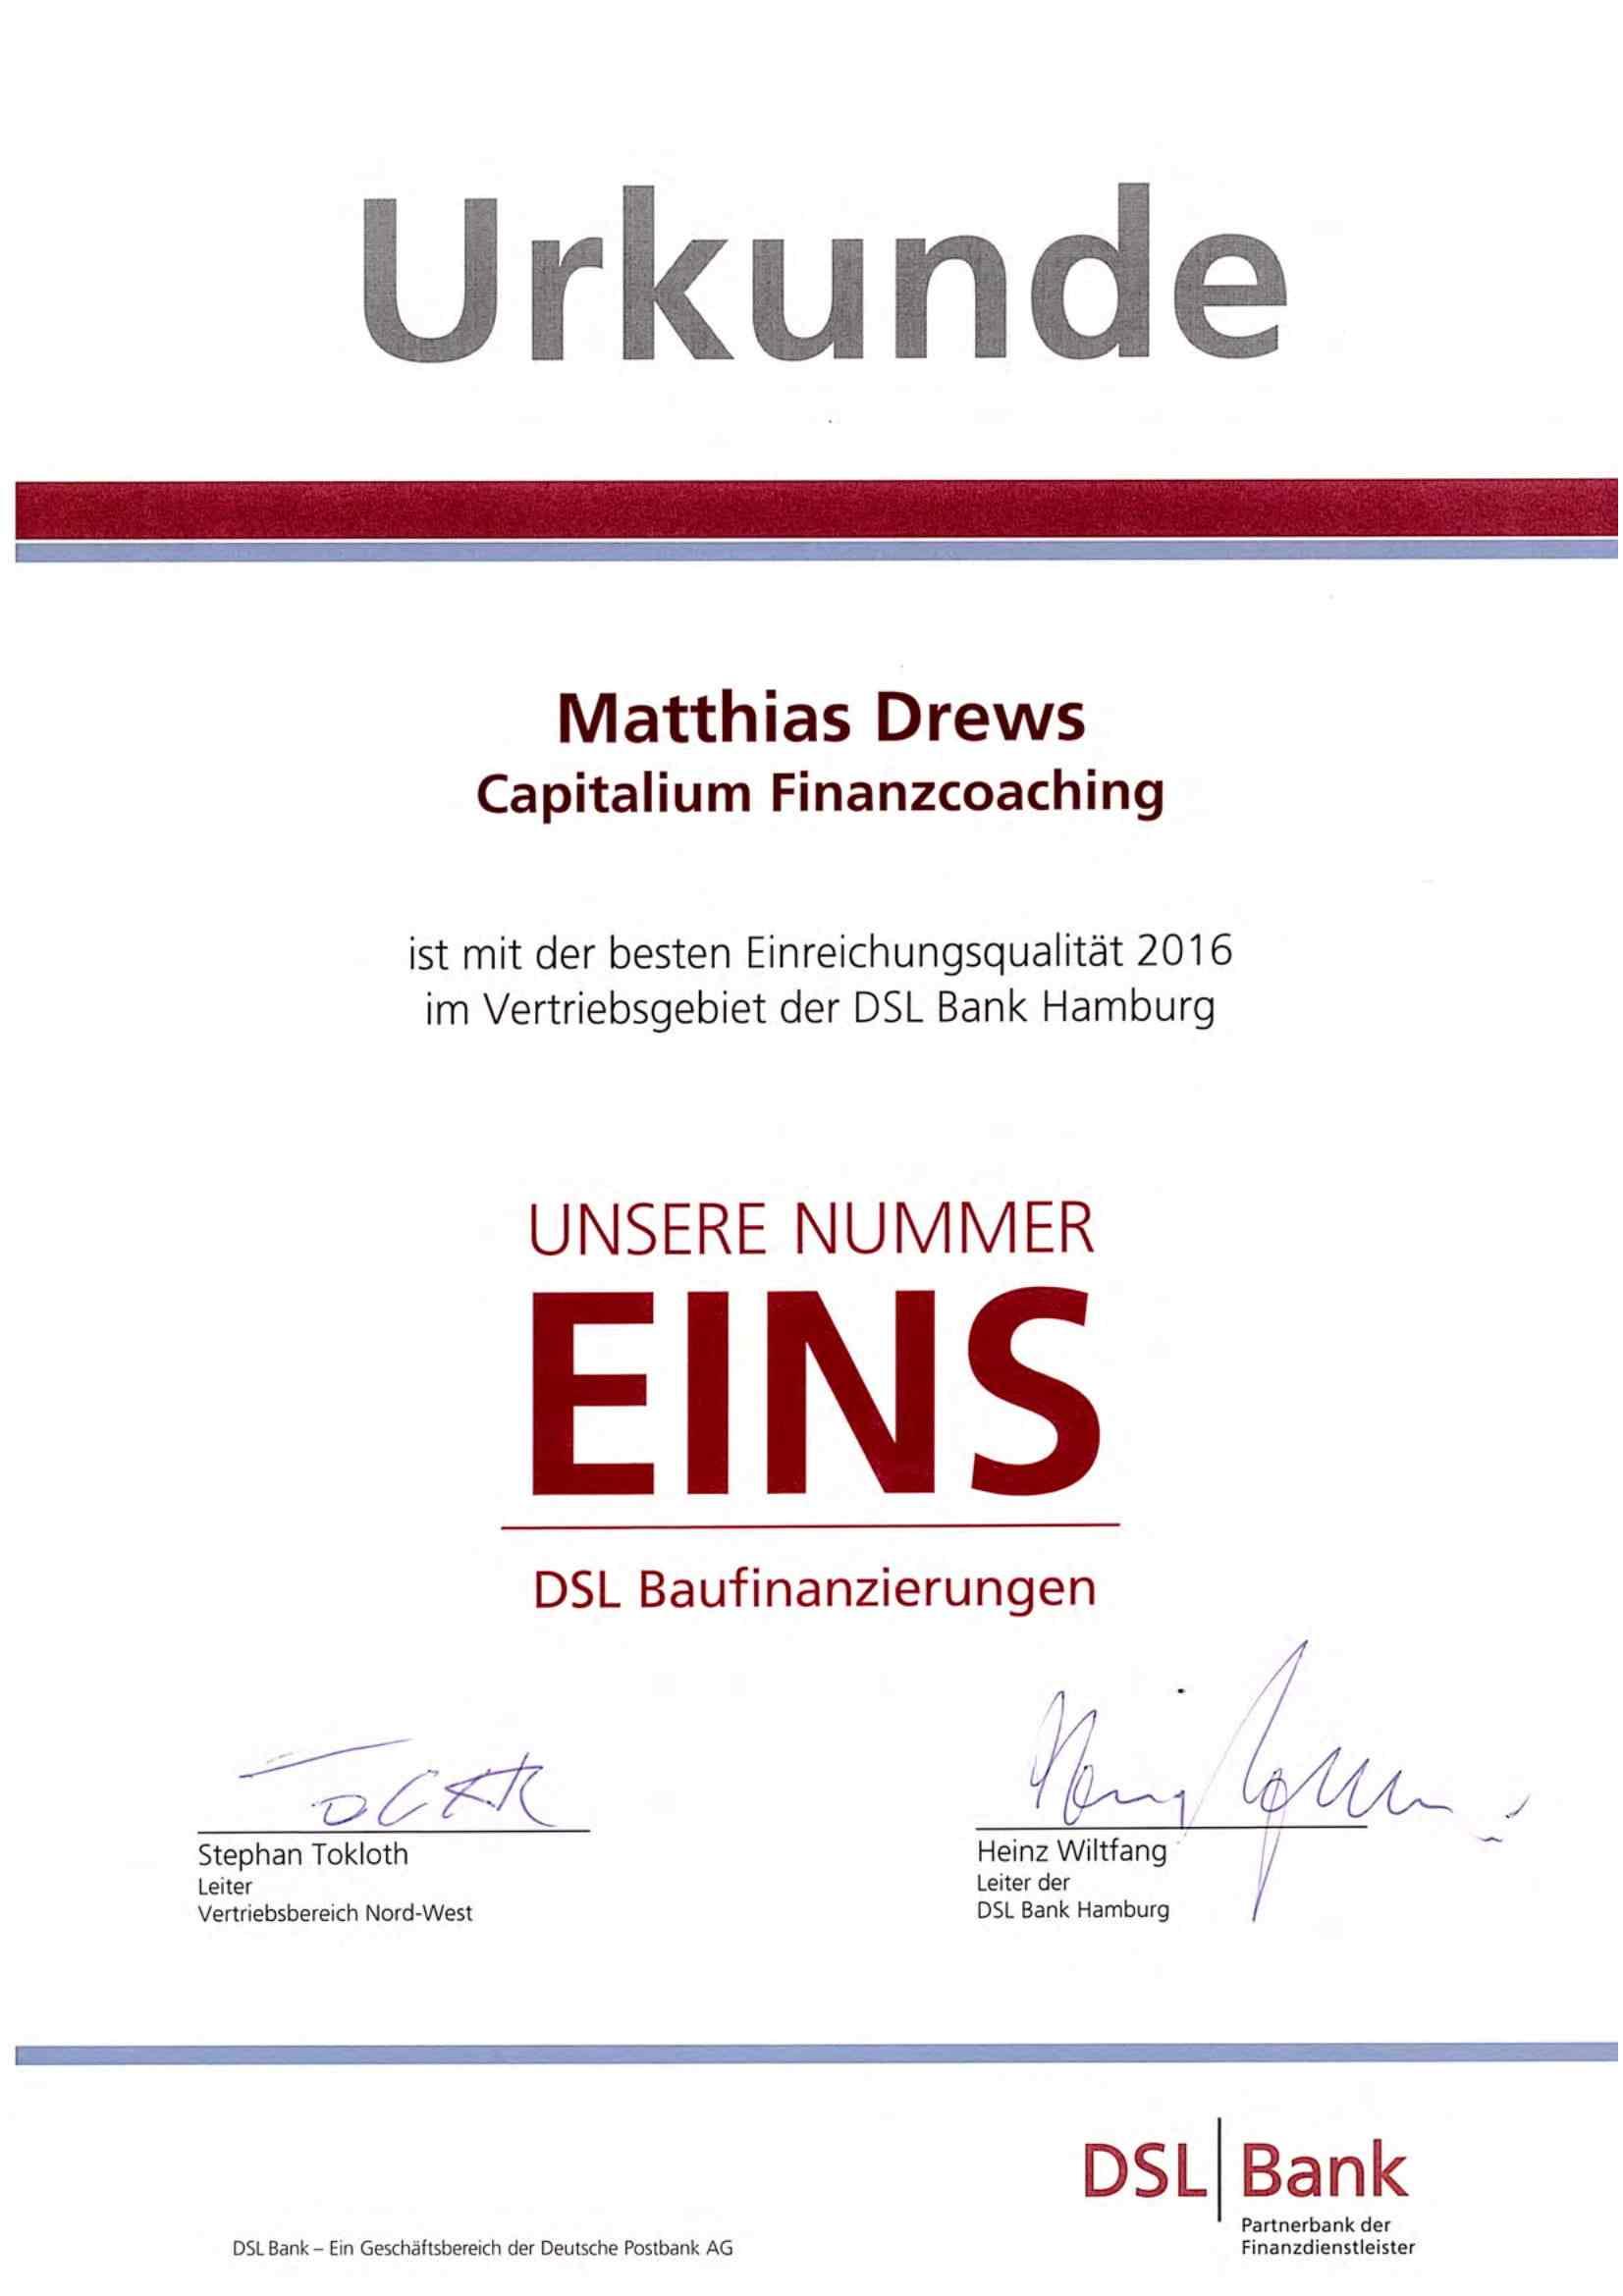 Urkunde DSL Bank Capitalium Finanzberater Baufinanzierung Hamburg Kredit Immobilienkauf Matthias Drews Anja Willumeit Baufi